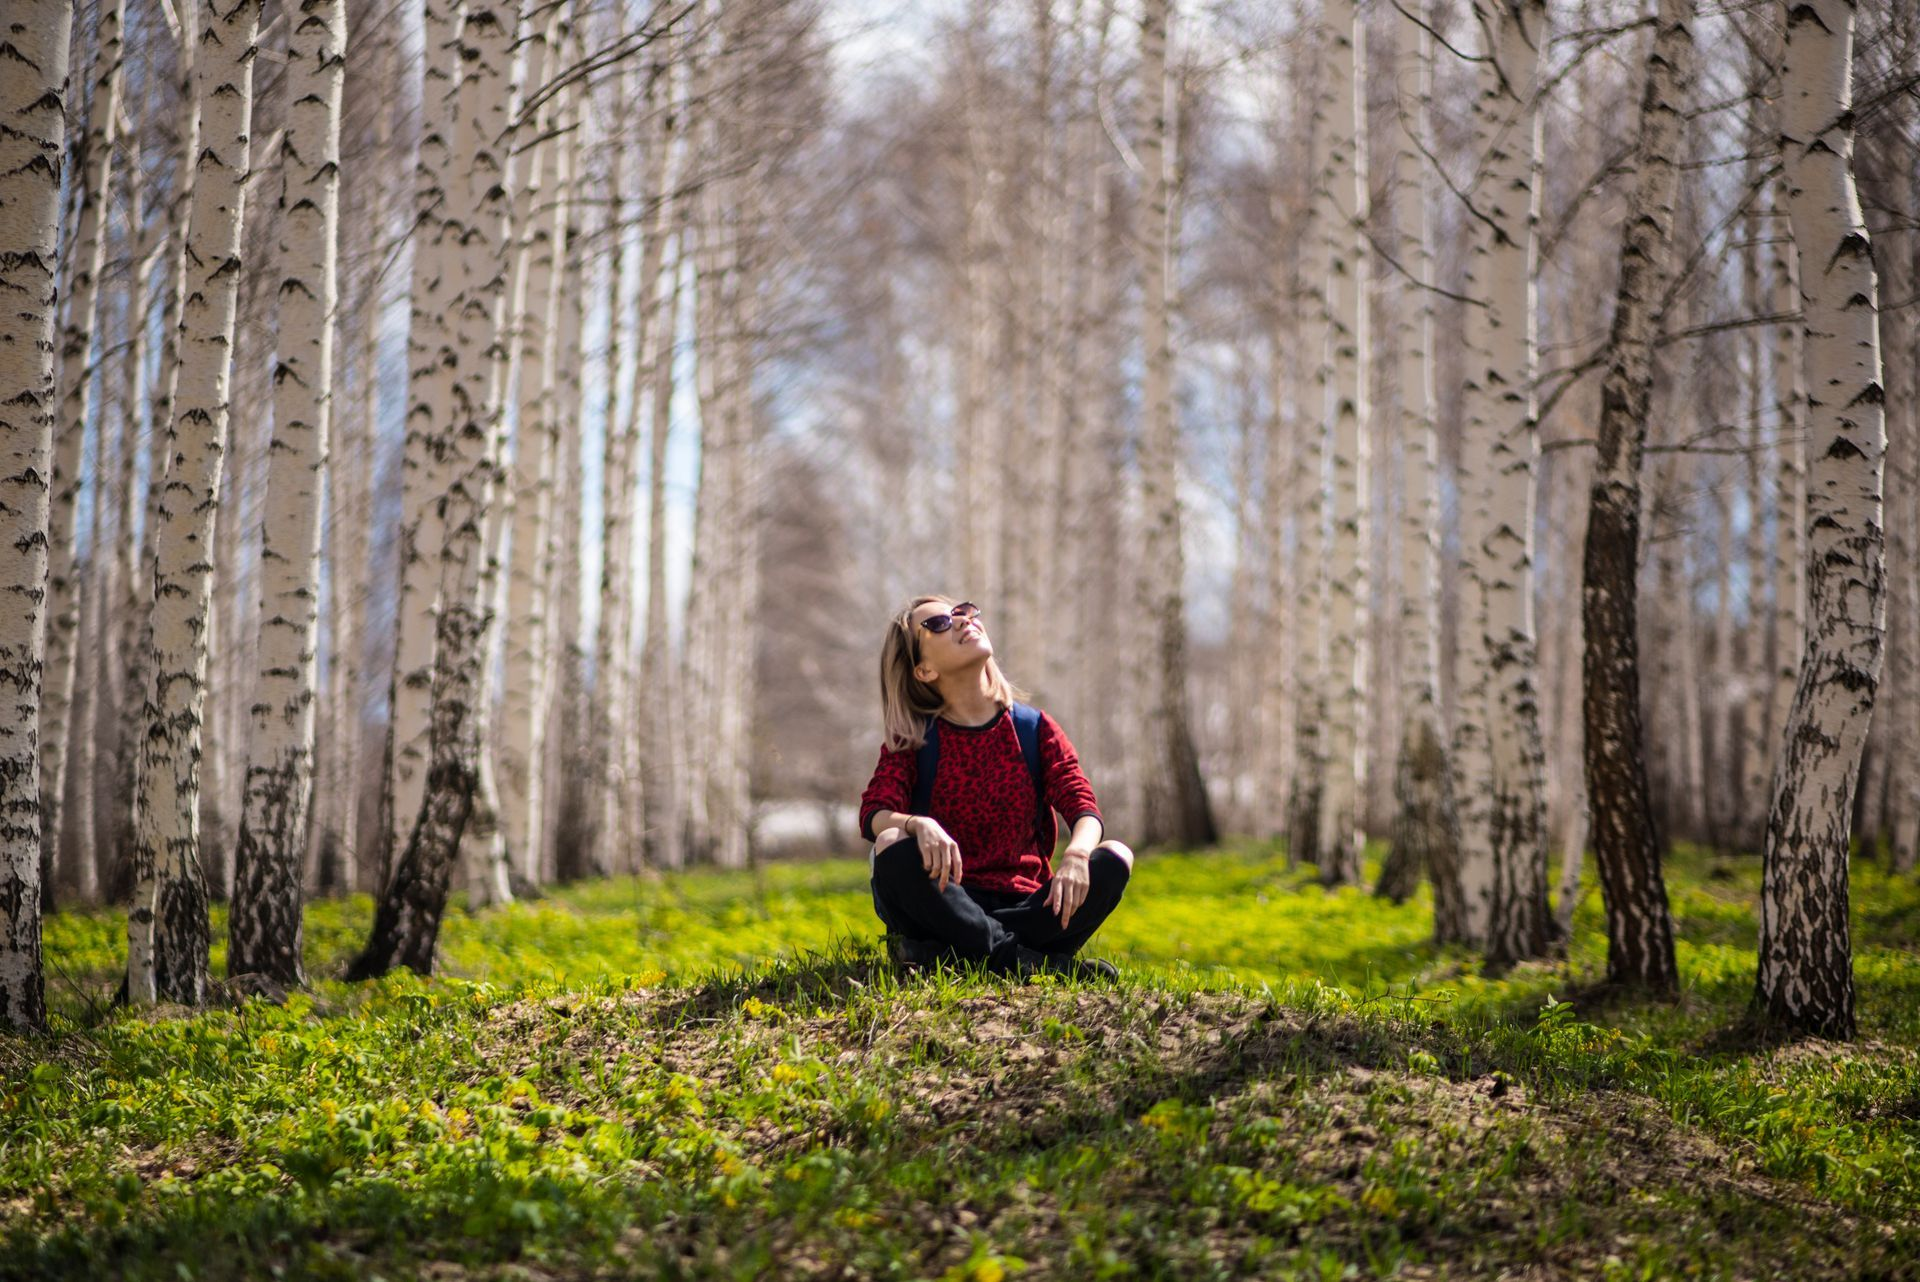 Pobyt w sercu lasu